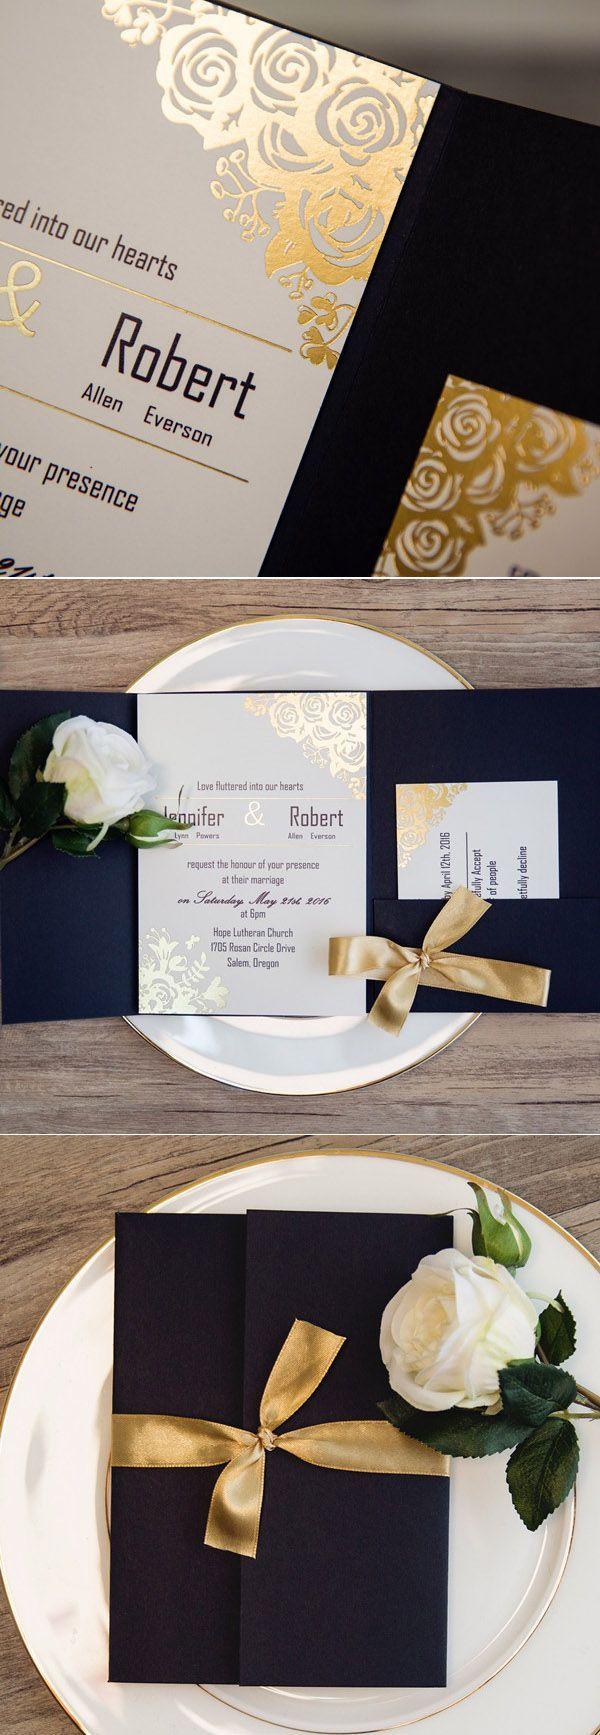 16953 best Wedding Invitation images on Pinterest   Wedding ideas ...